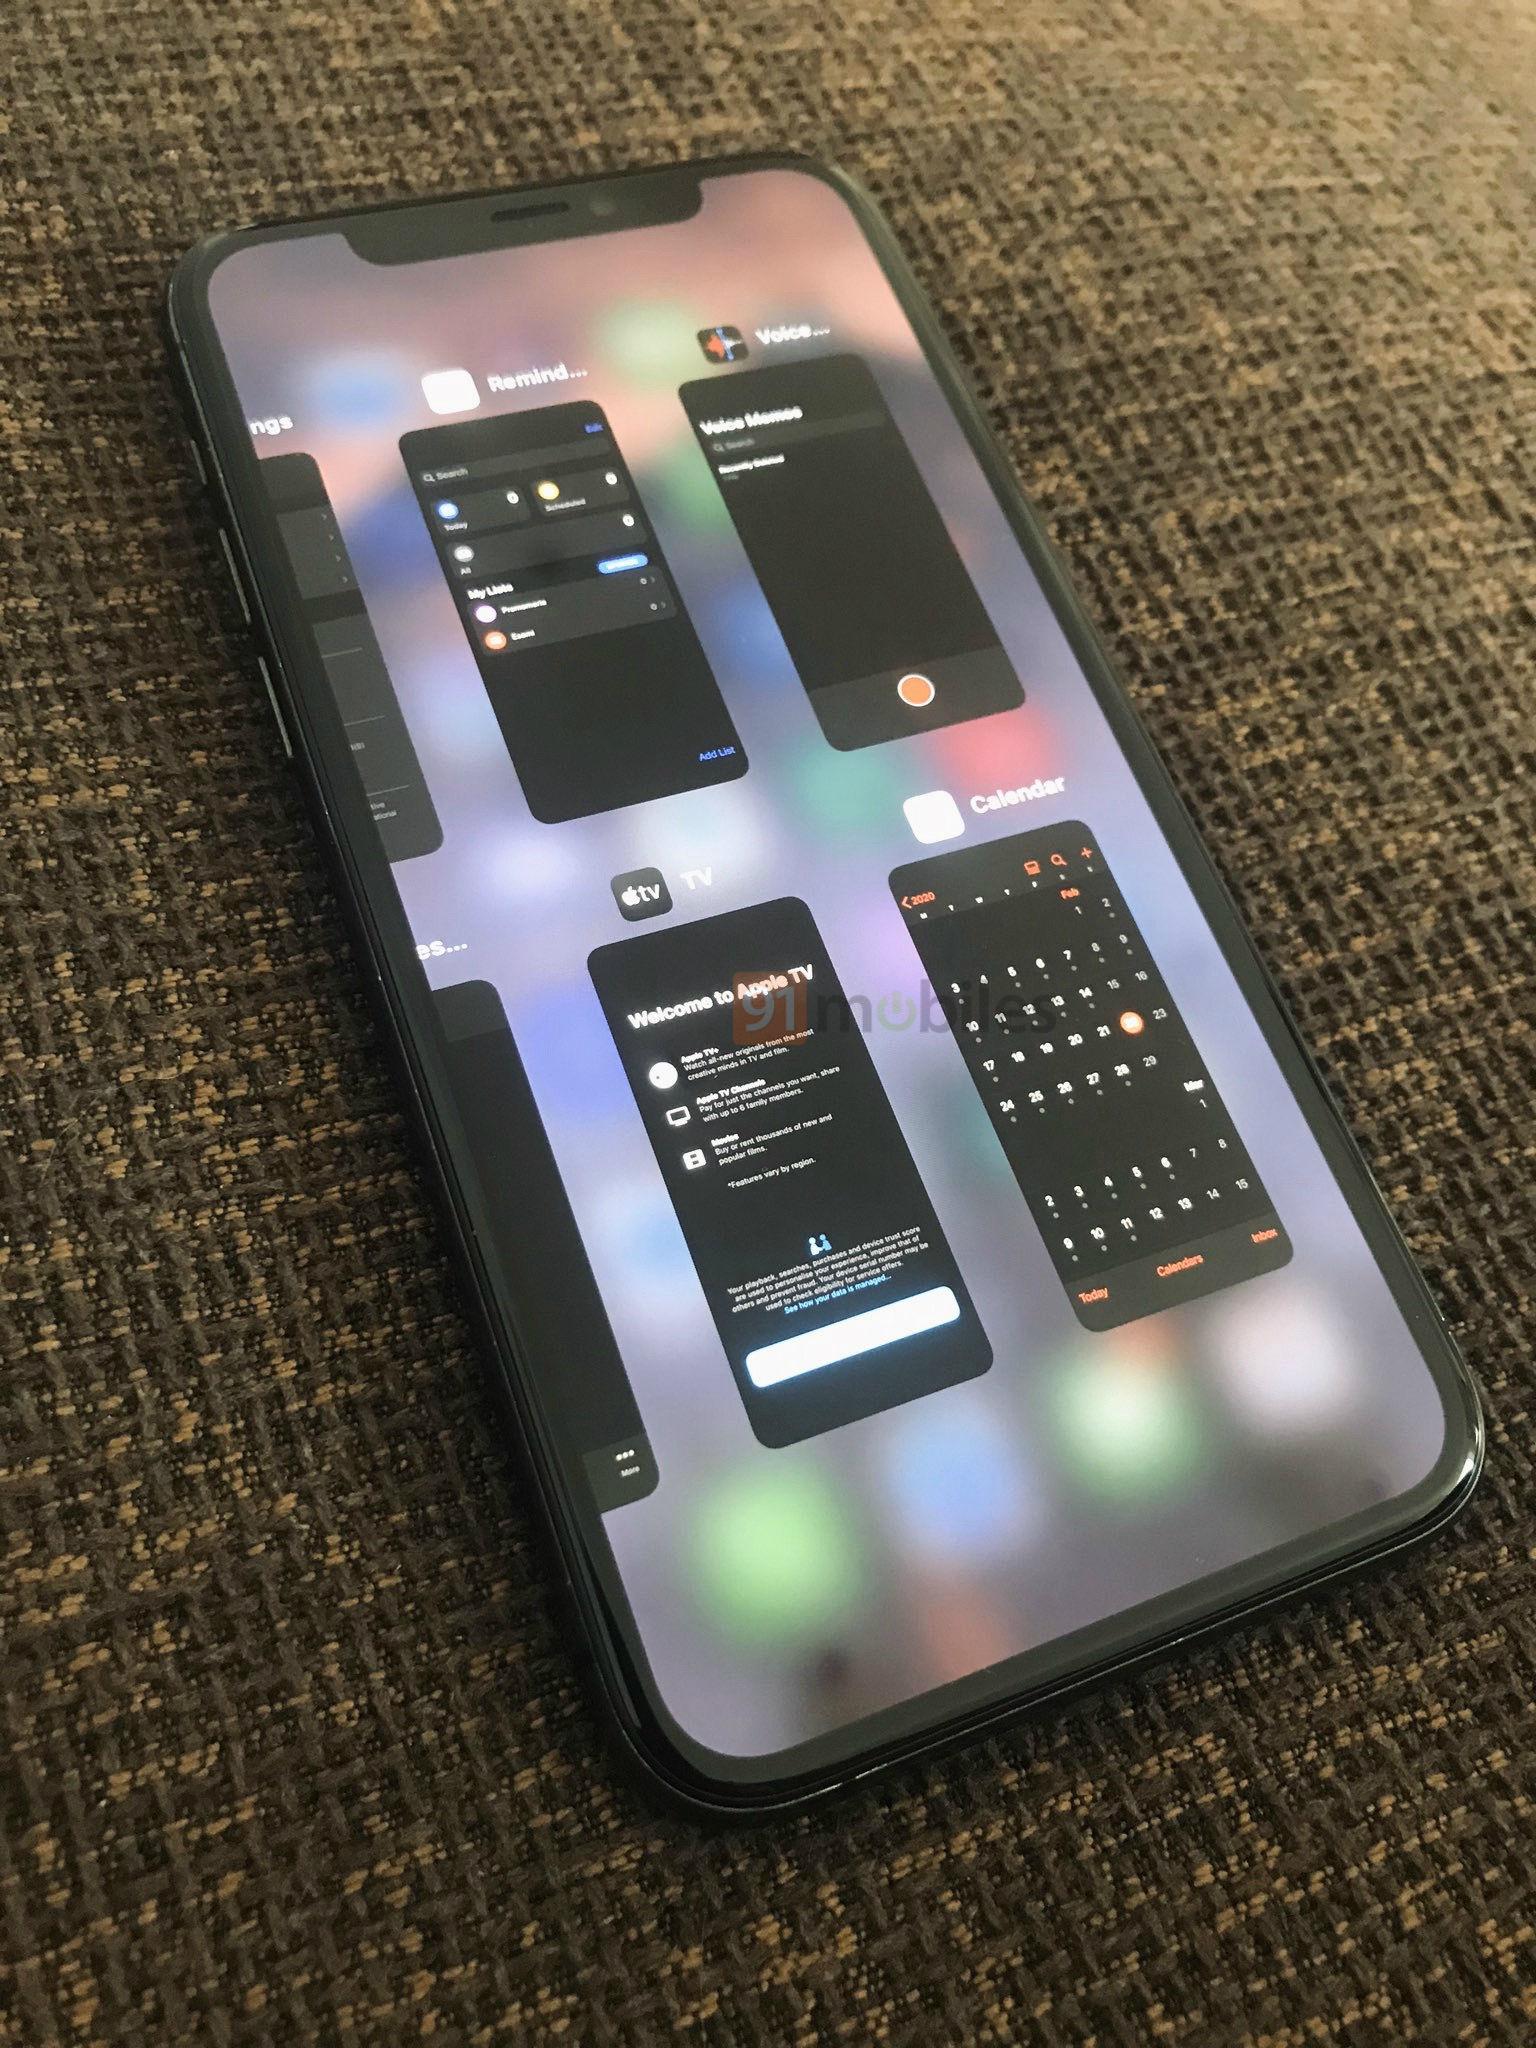 iOS 14 appkiezer video.